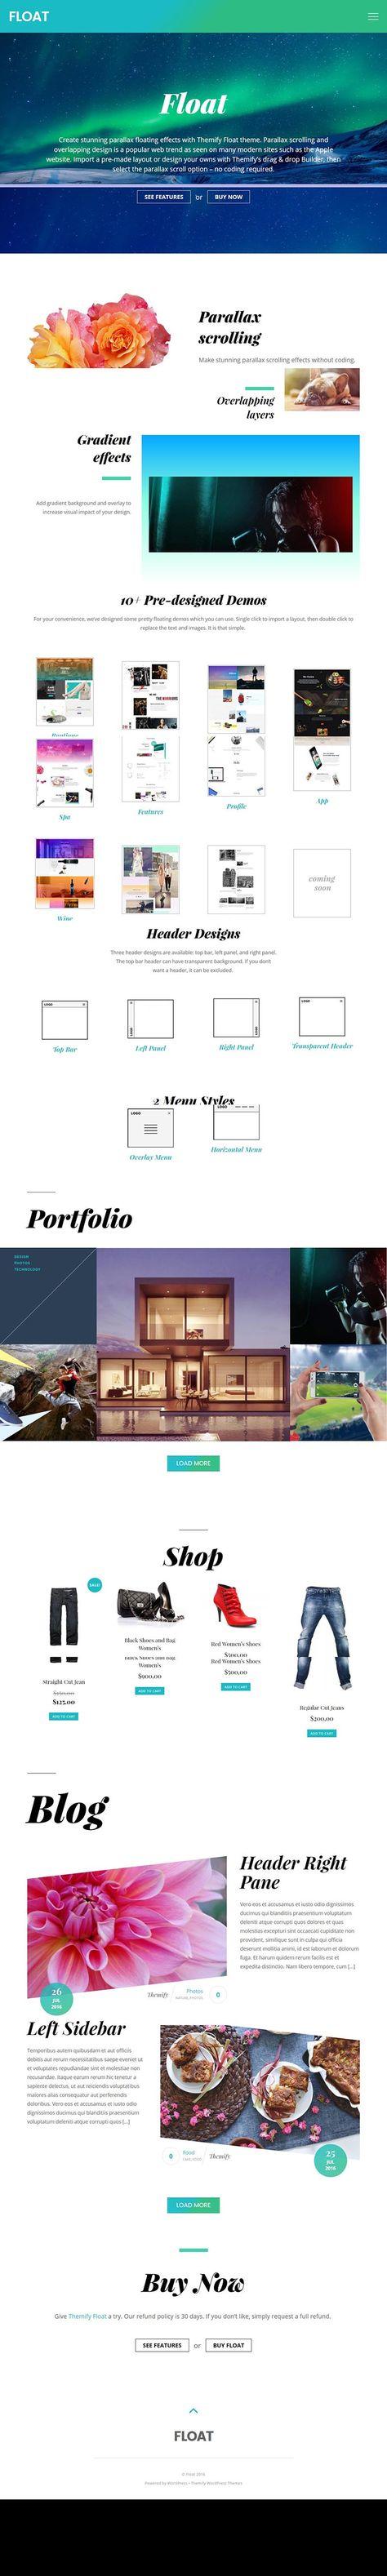 Float+Responsive,+Parallax,+Modern+WordPress+Magazine+Theme http://www.themesandmods.com/premium-wordpress-themes/float/